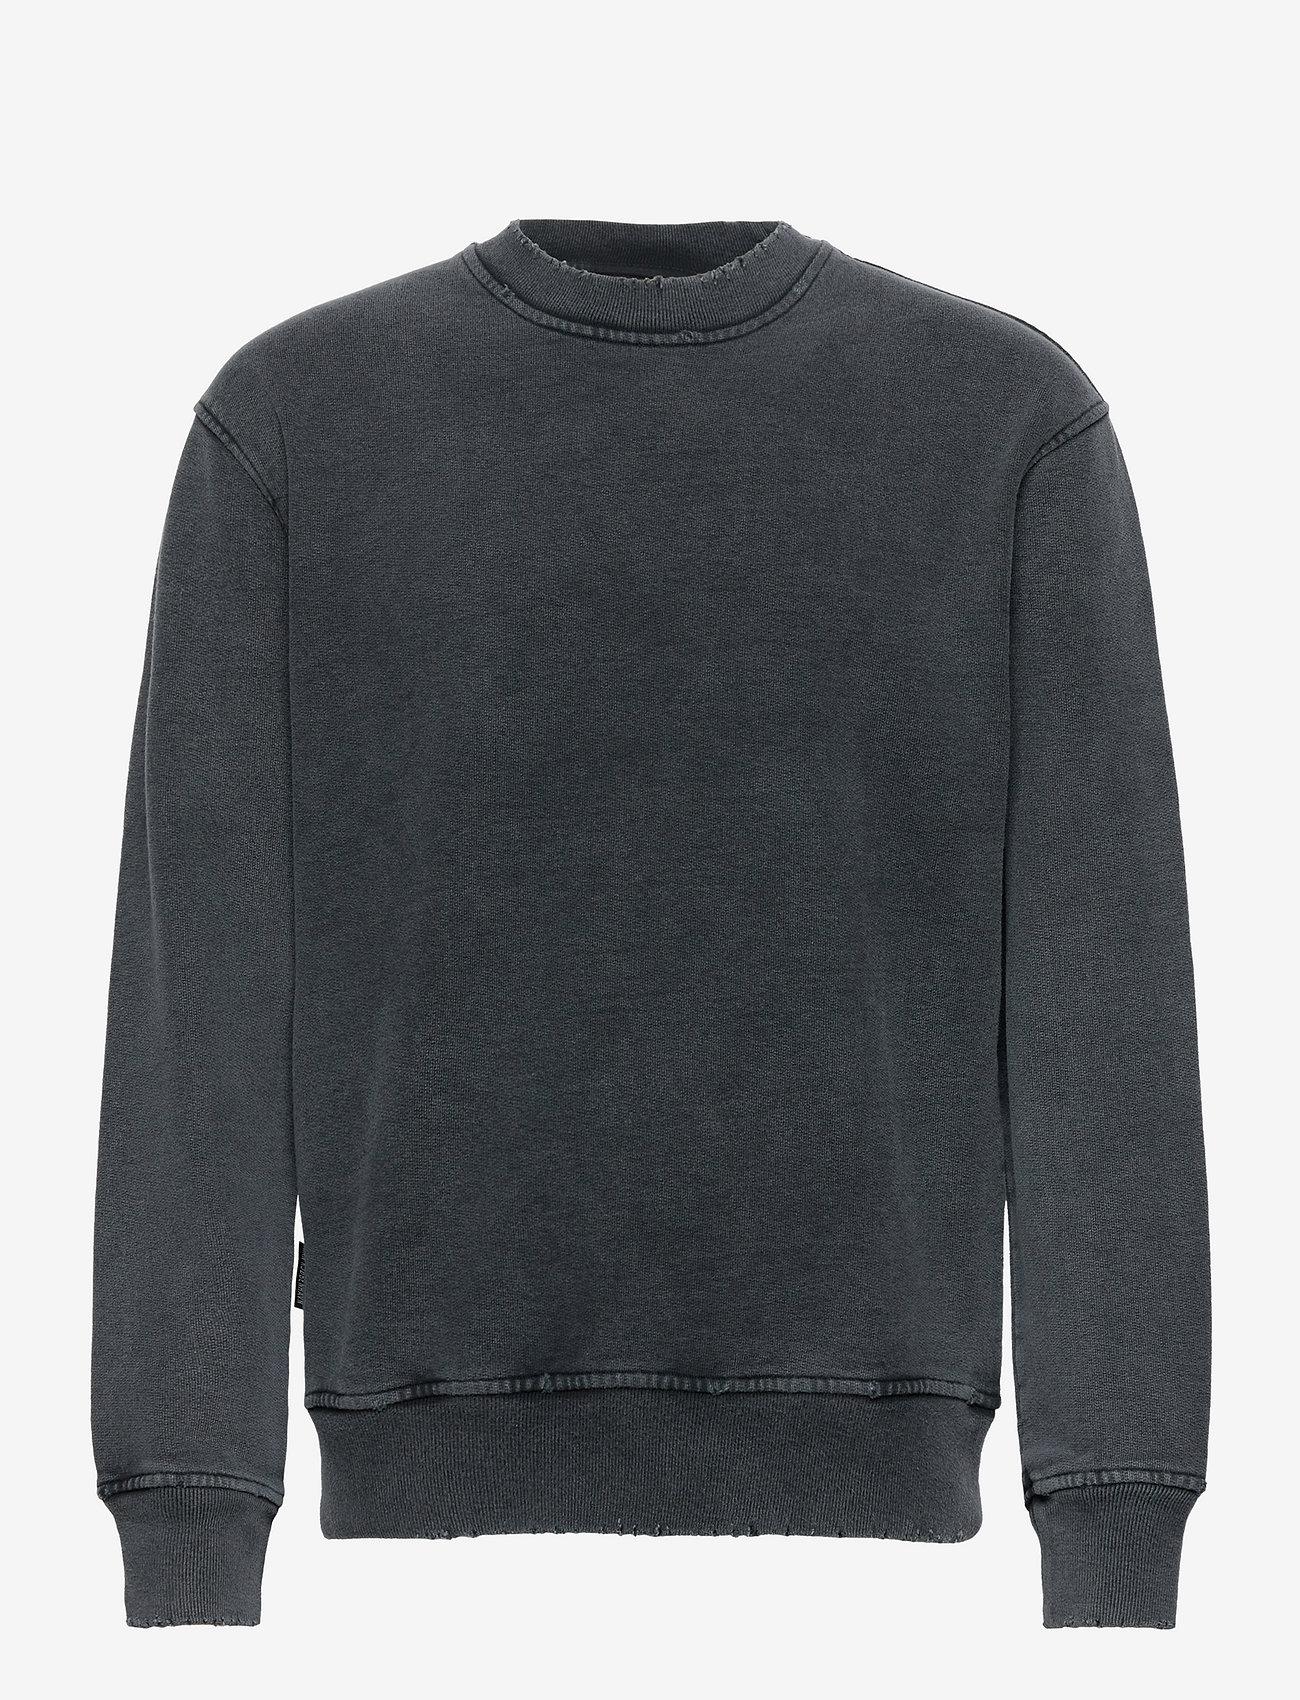 HAN Kjøbenhavn - Distressed Crew - truien - distressed dark grey - 0